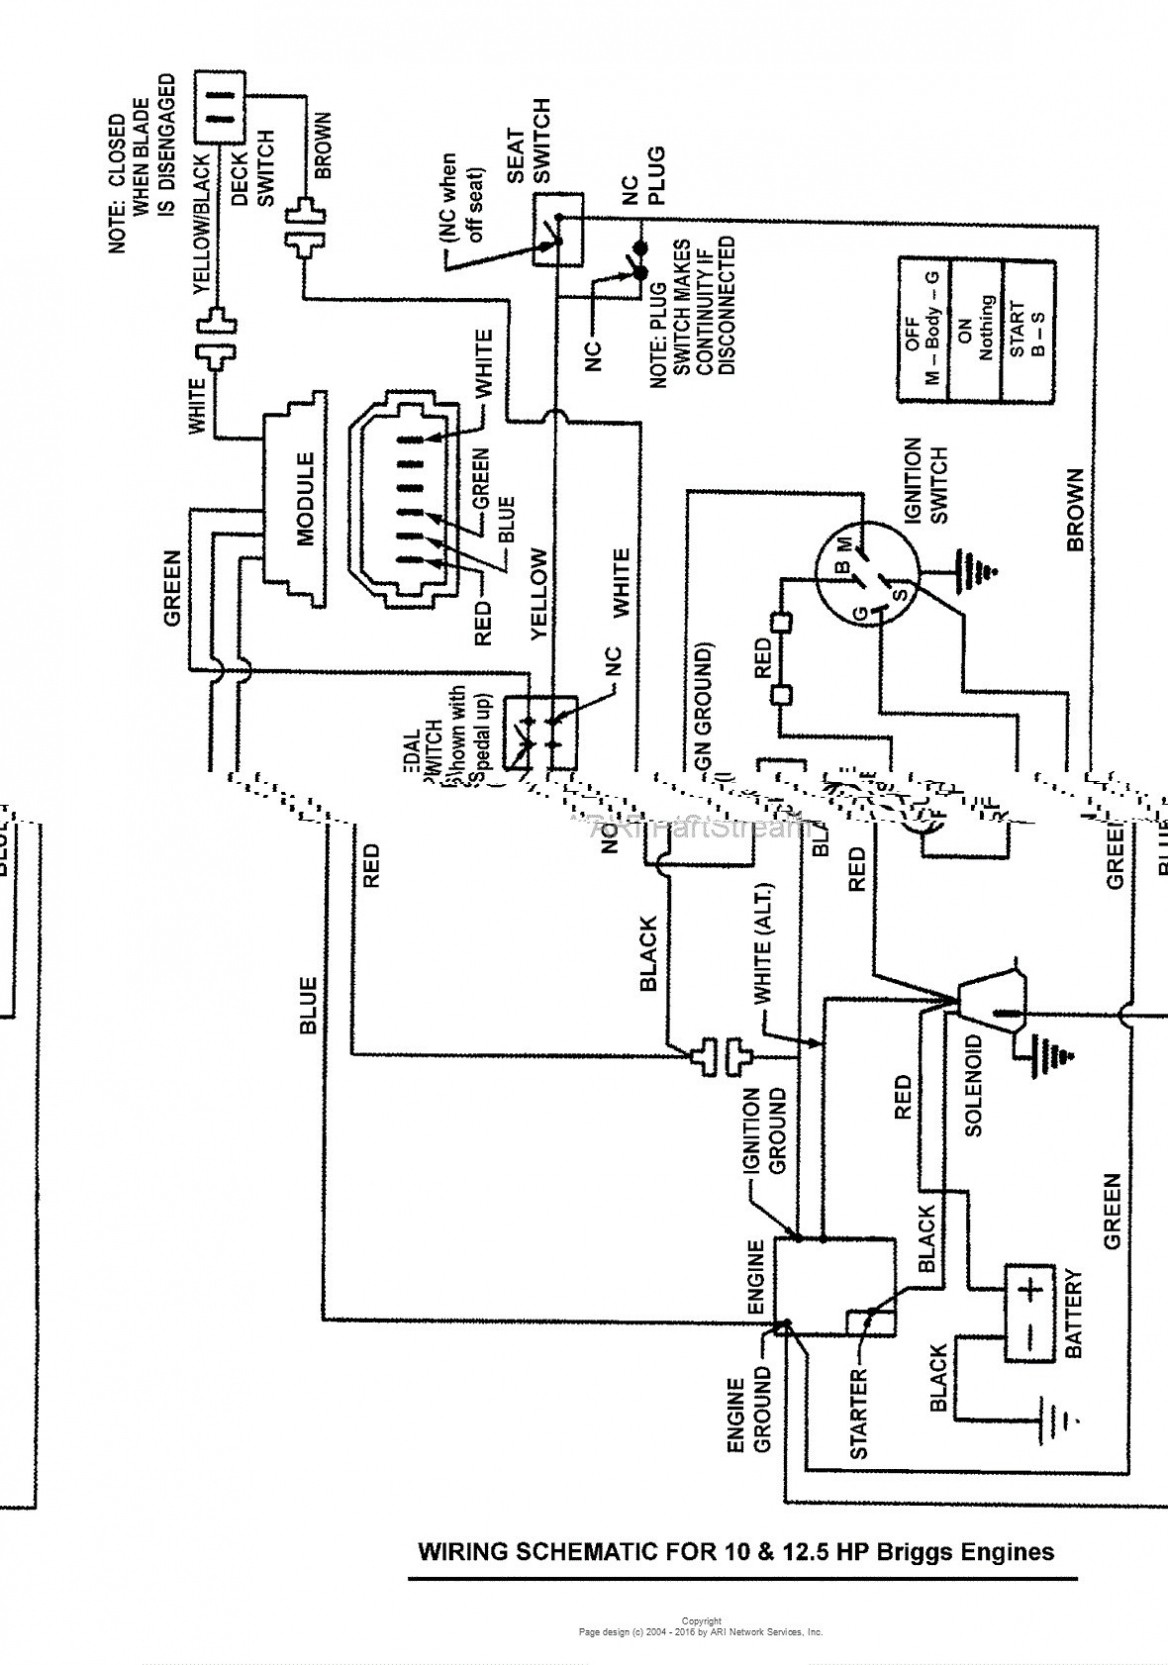 briggs and stratton 22 hp engine diagram briggs stratton engine wiring  diagram – briggs and stratton